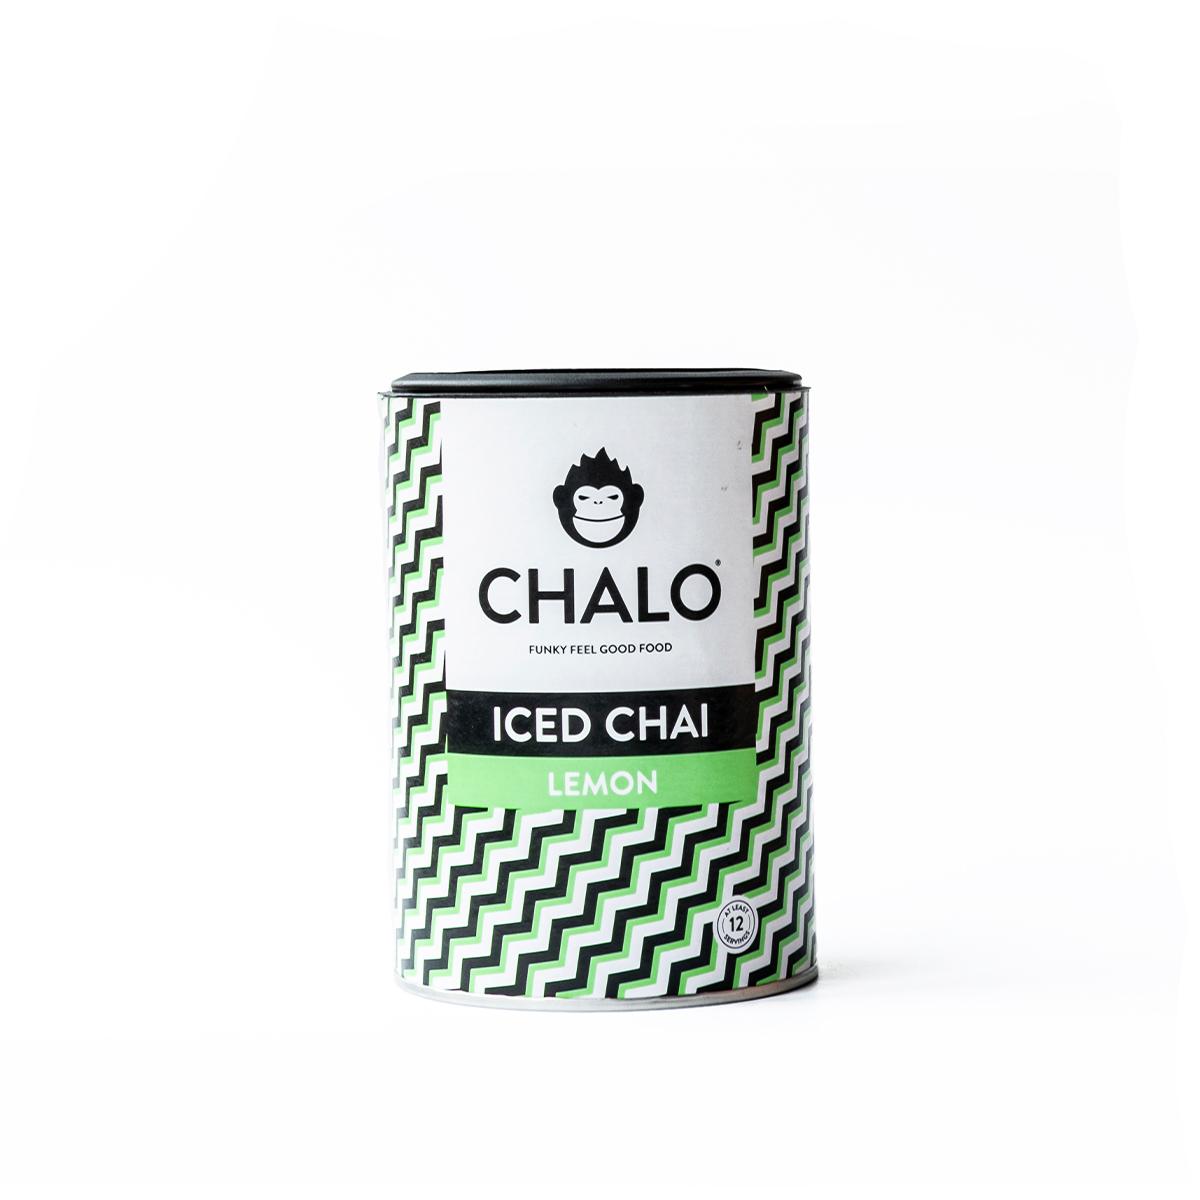 CHALO Lemon Iced Chai